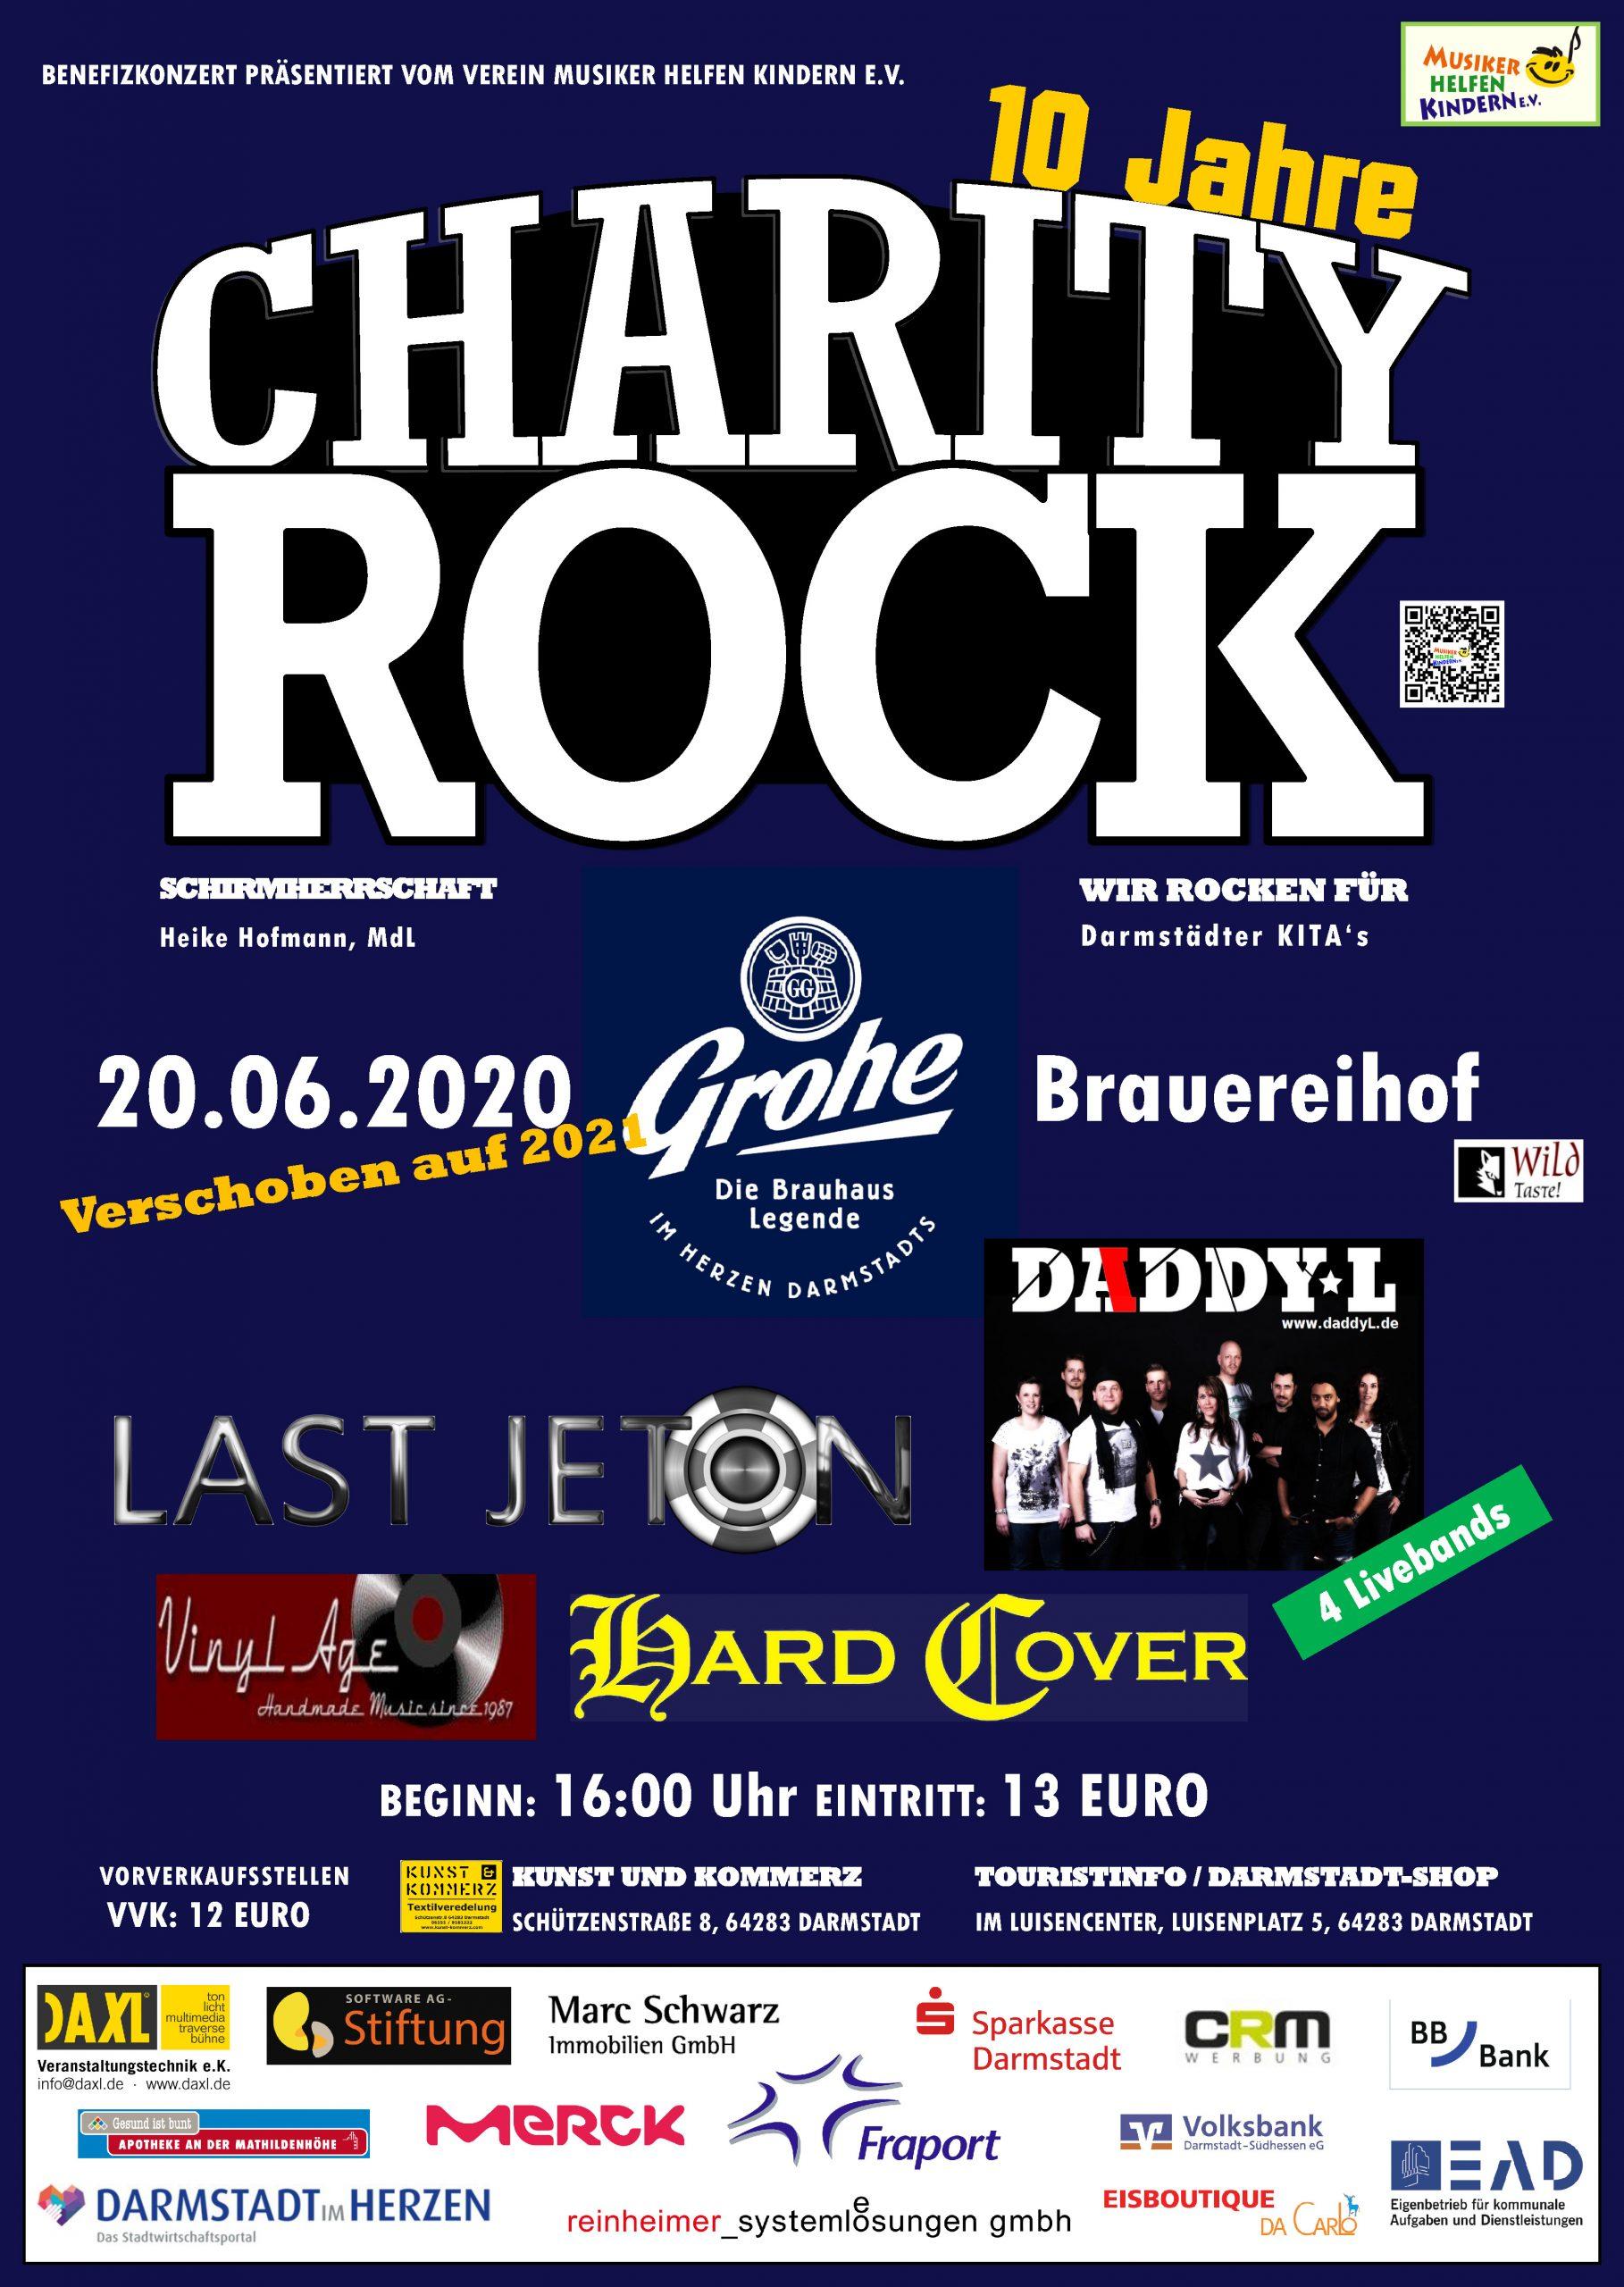 Charity Rock 2020/2021